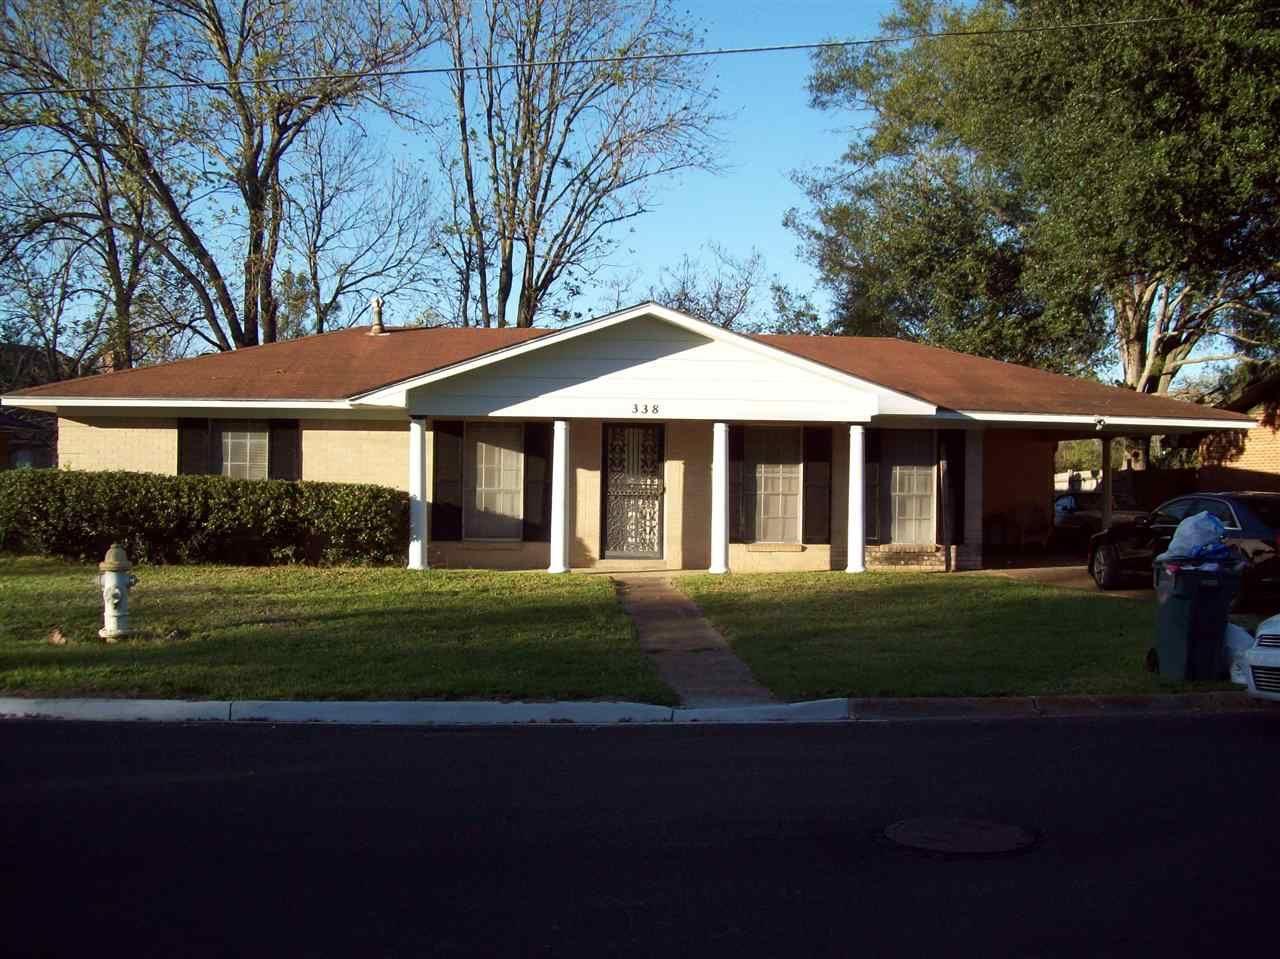 338 W 13TH ST, Yazoo City, MS 39194 - MLS#: 335990